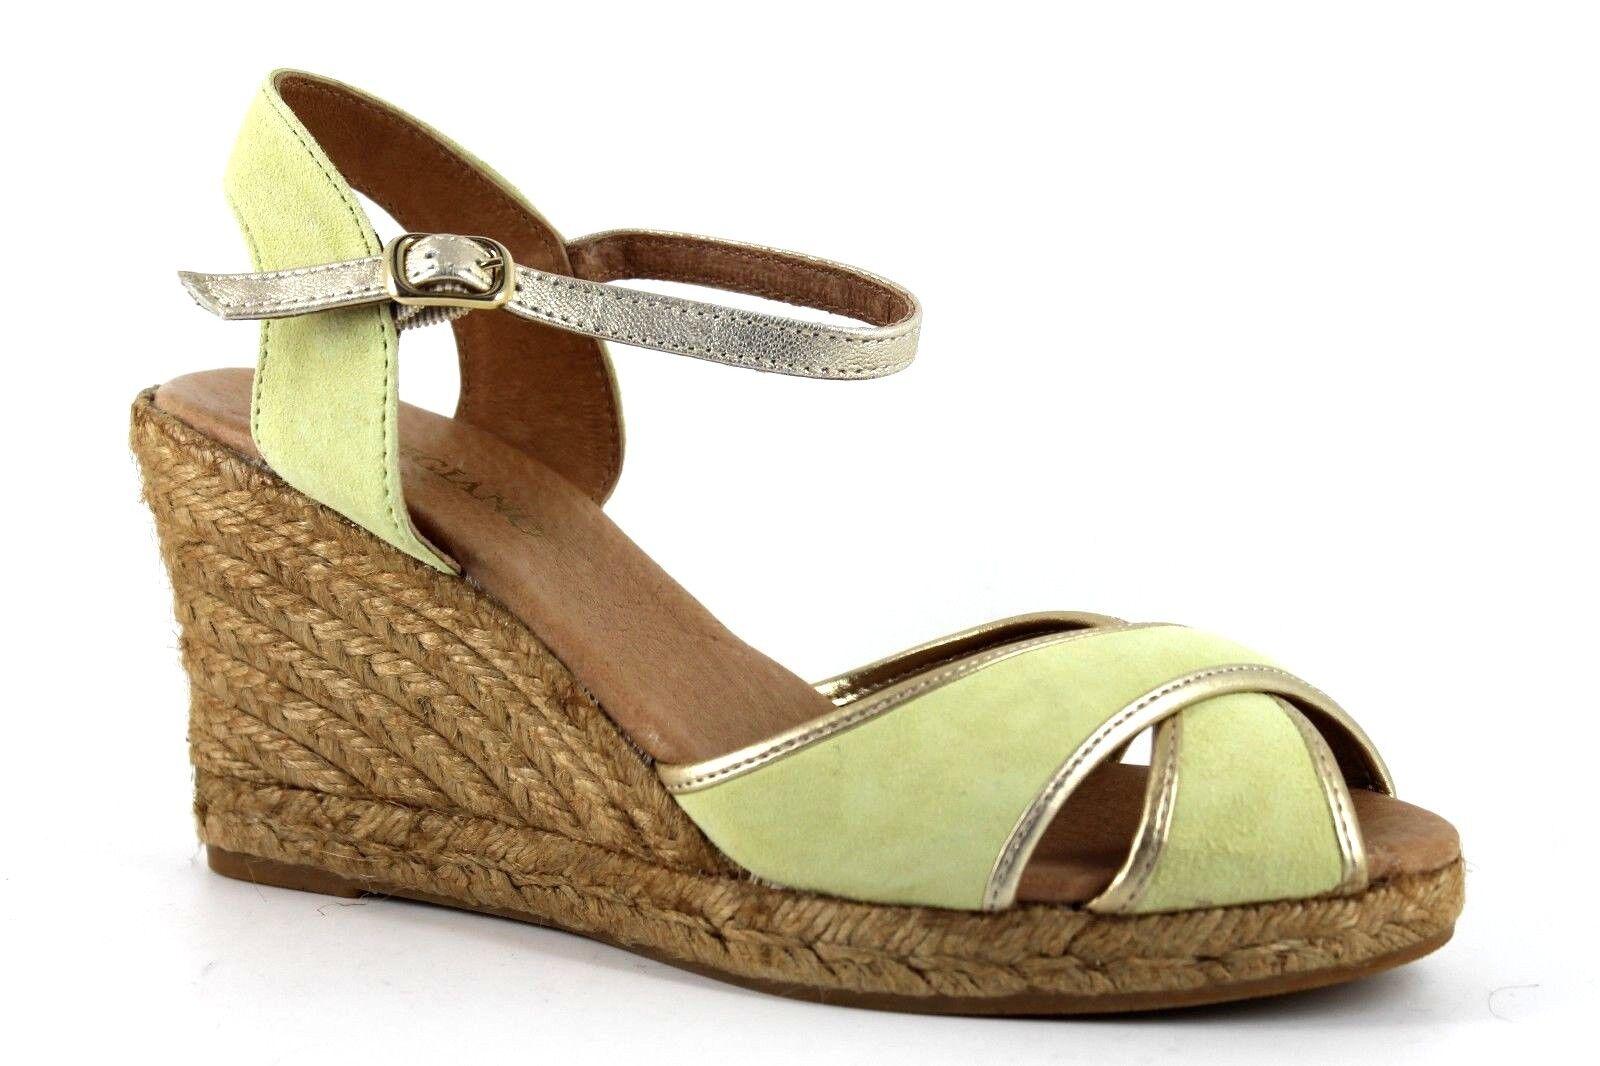 Artigiano Womens UK 5 EU 38 Suede Wedge Heel Pale Green gold Espadrille Sandals